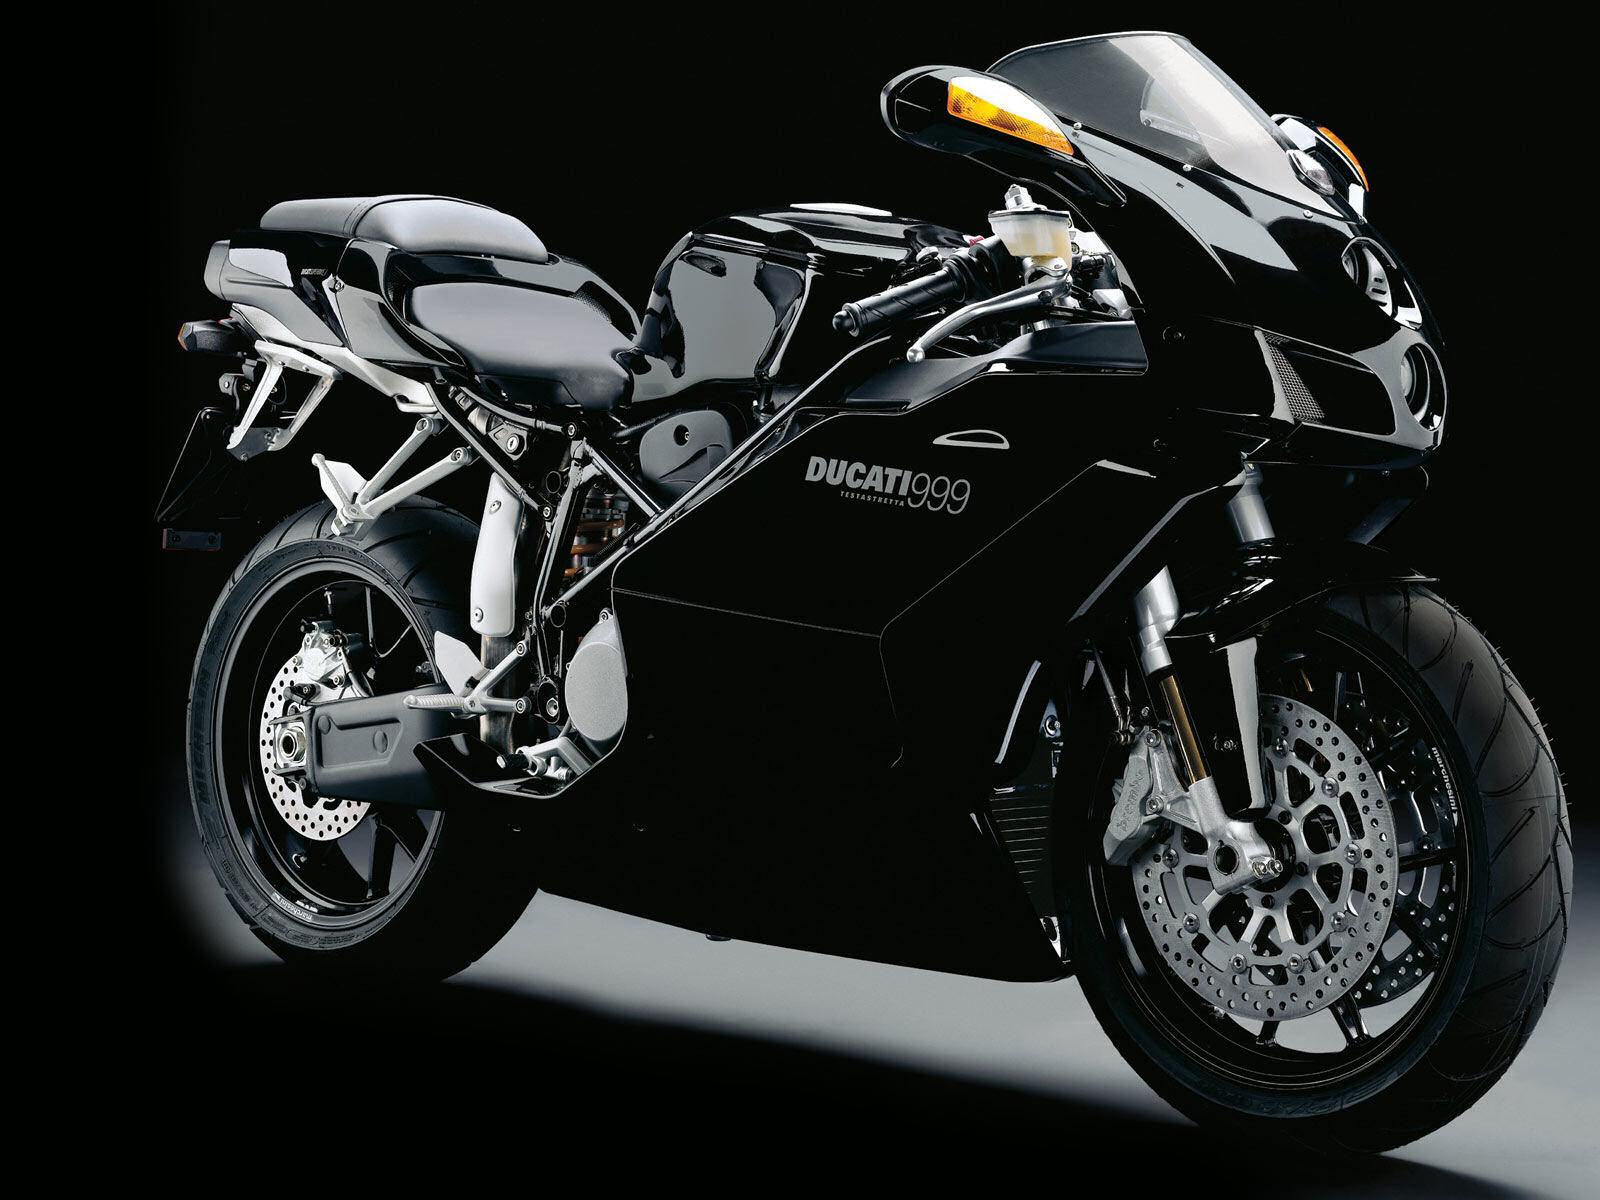 Ducati Bike Wallpapers Sports Bikes For Desktop Stunt Latest Ninja